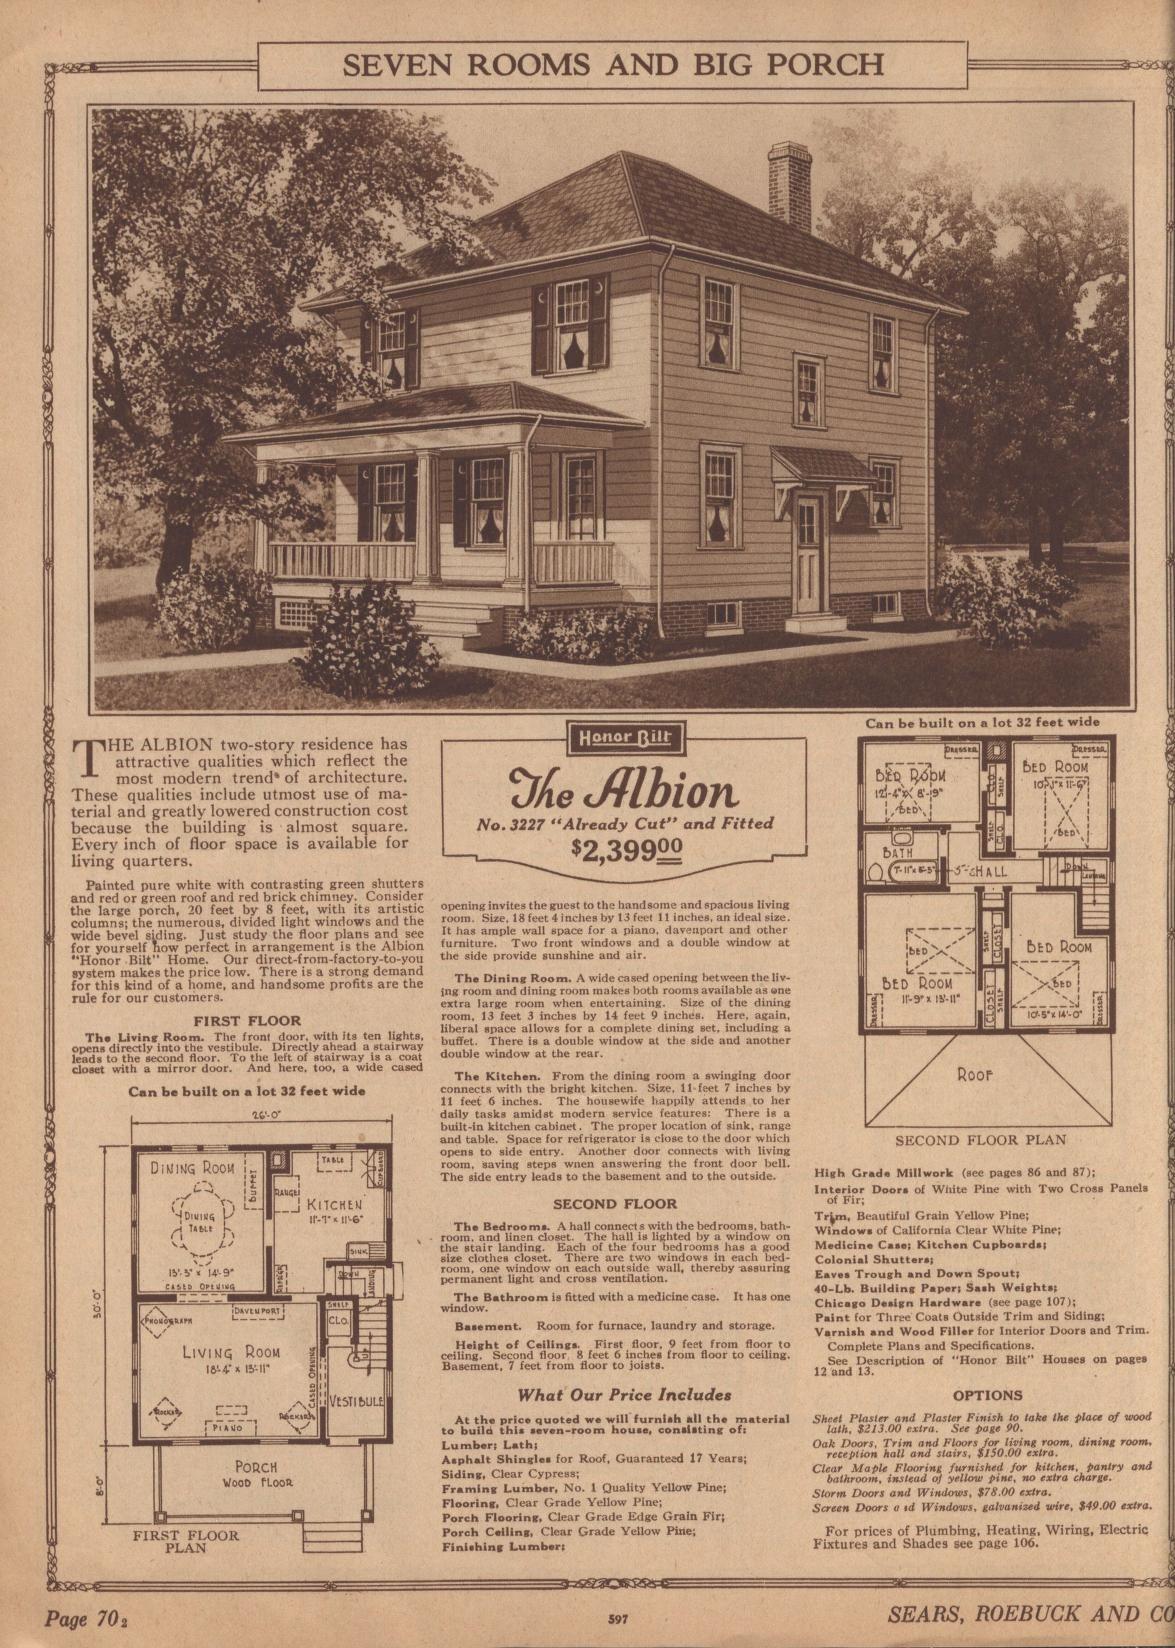 Sears Albion 1925 3227 1926 P3227 1927 1928 Vintage House Plans Big Porch Kit Homes